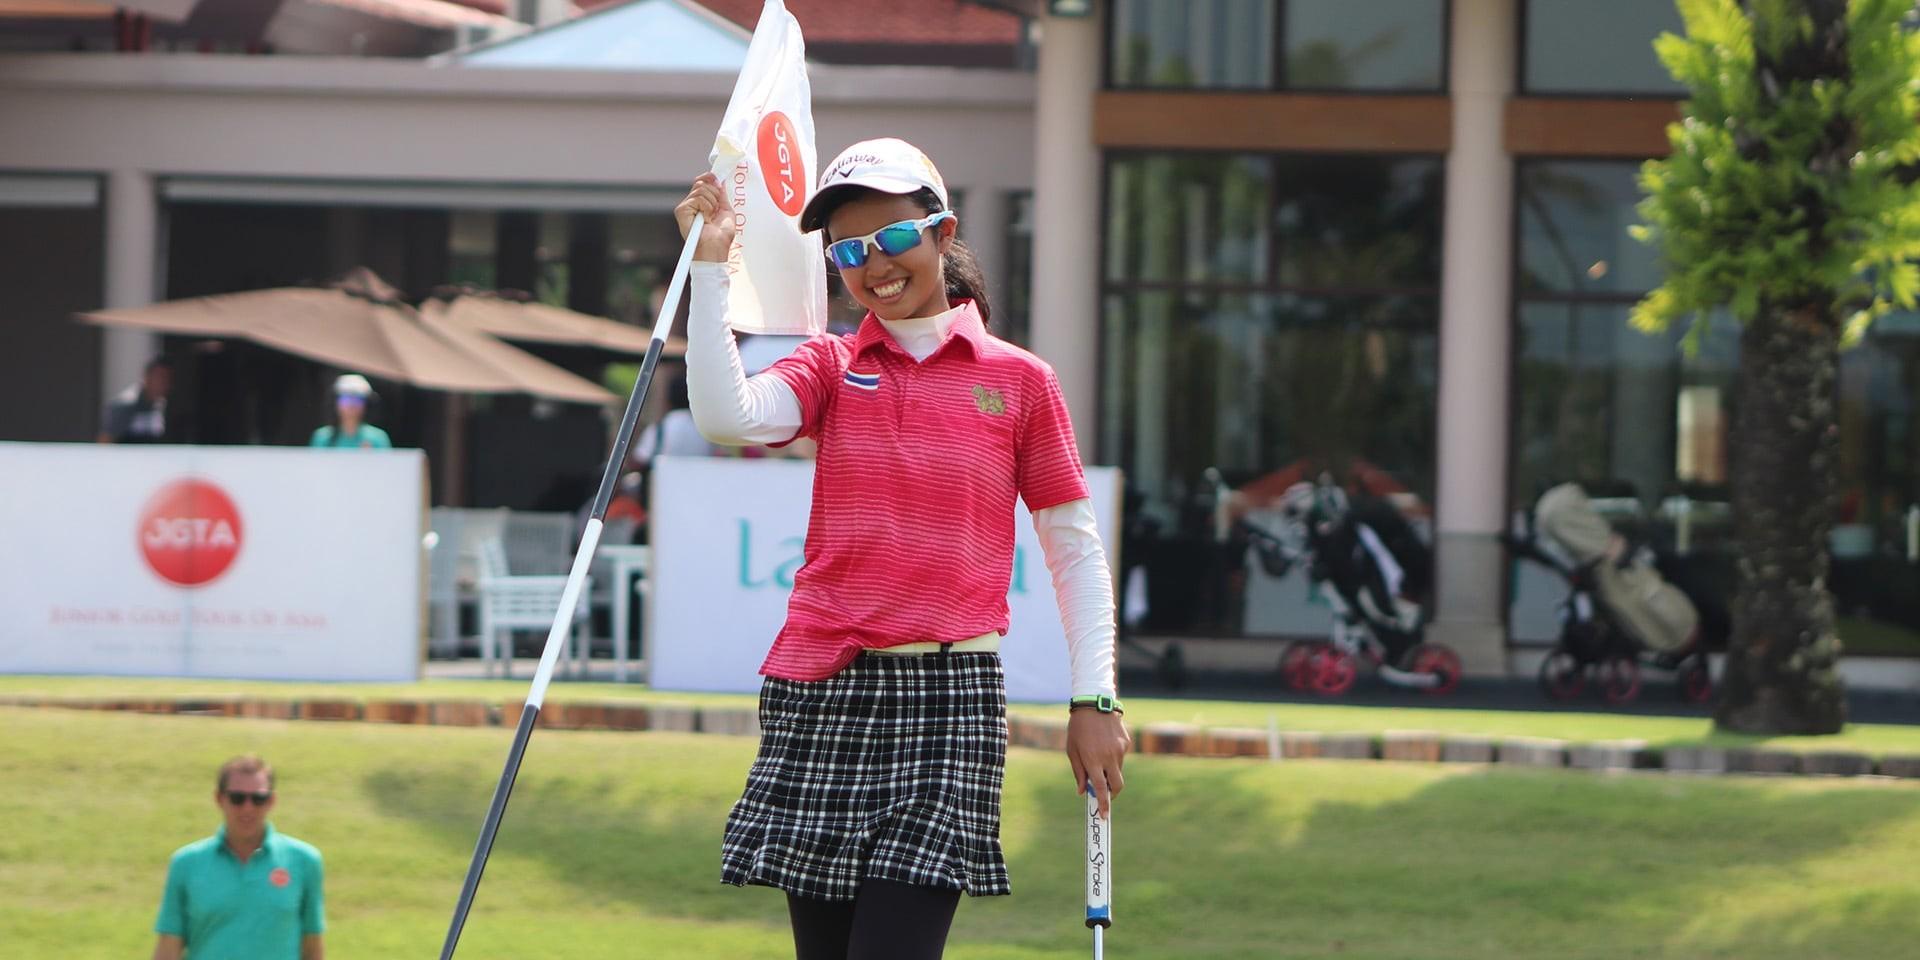 Tunwannarux Wins JGTA Phuket